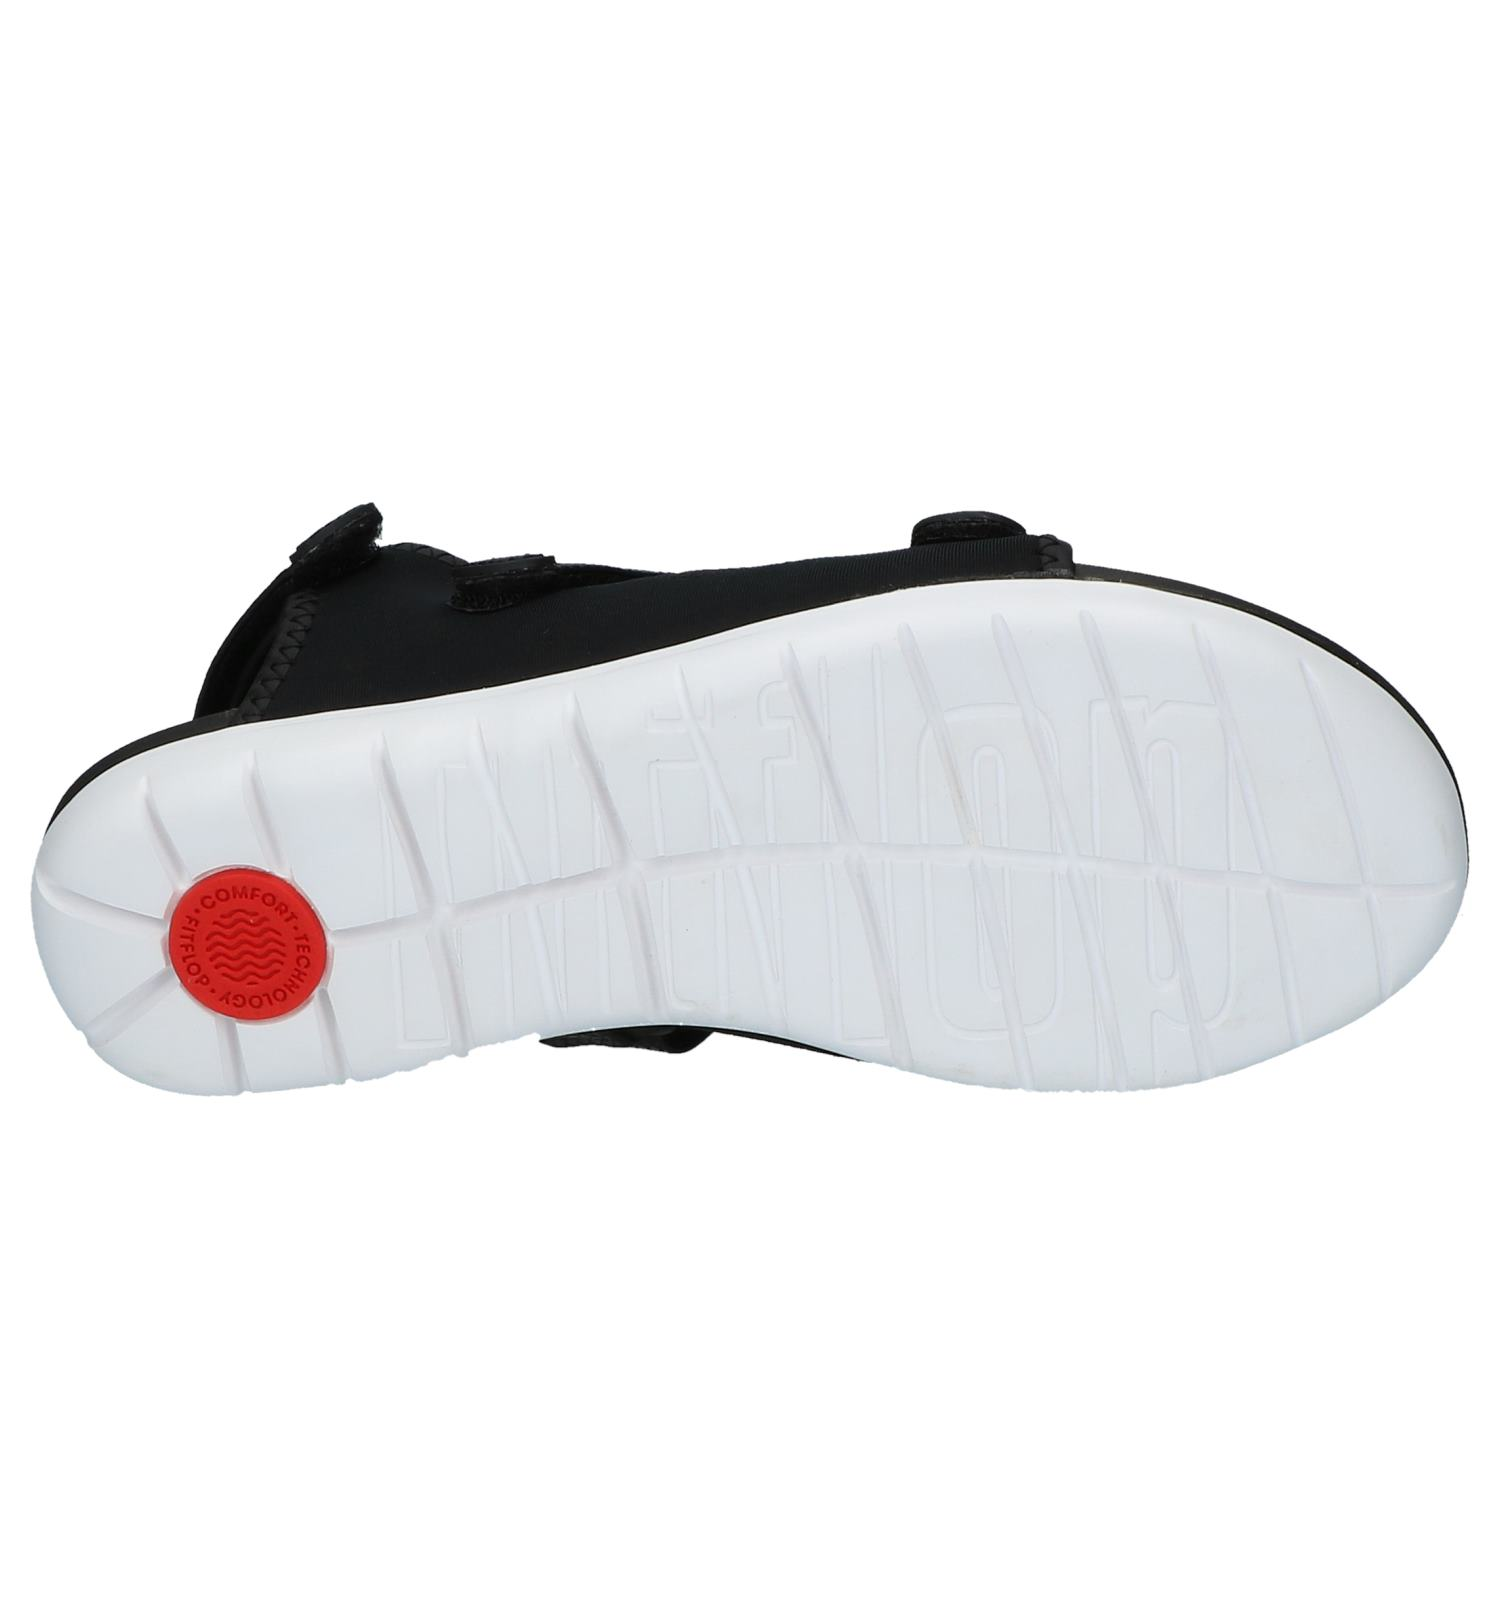 Neoflex Sandals Zwarte strap Sandalen Back Fitflop lFcKTJ1